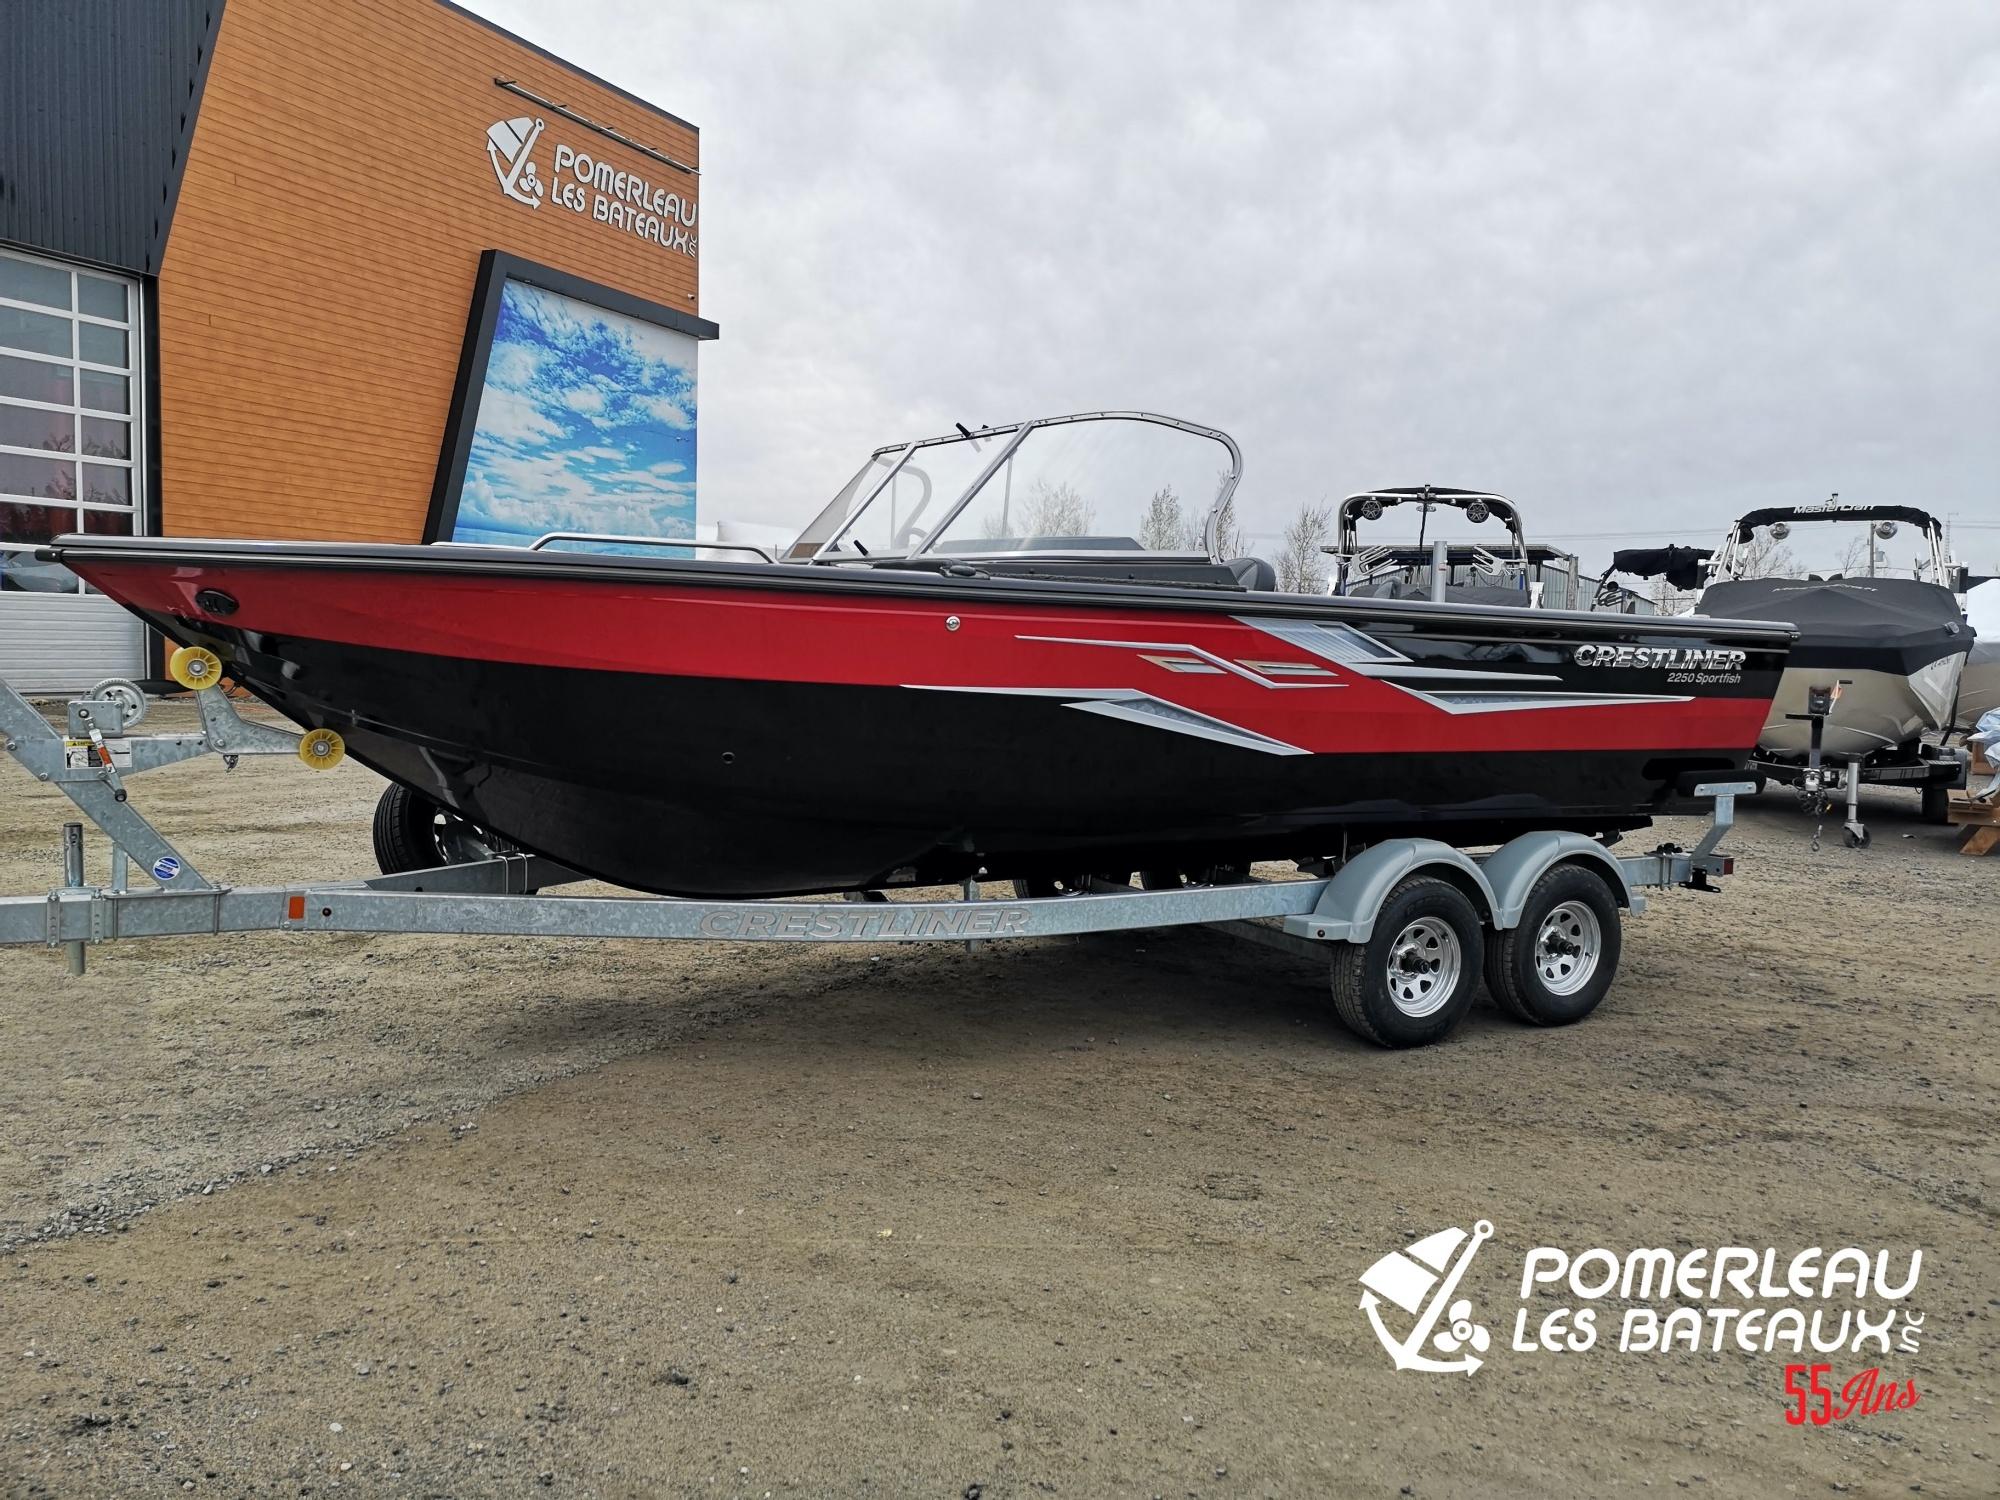 Crestliner Sportfish 2250 - IMG_20210503_140229